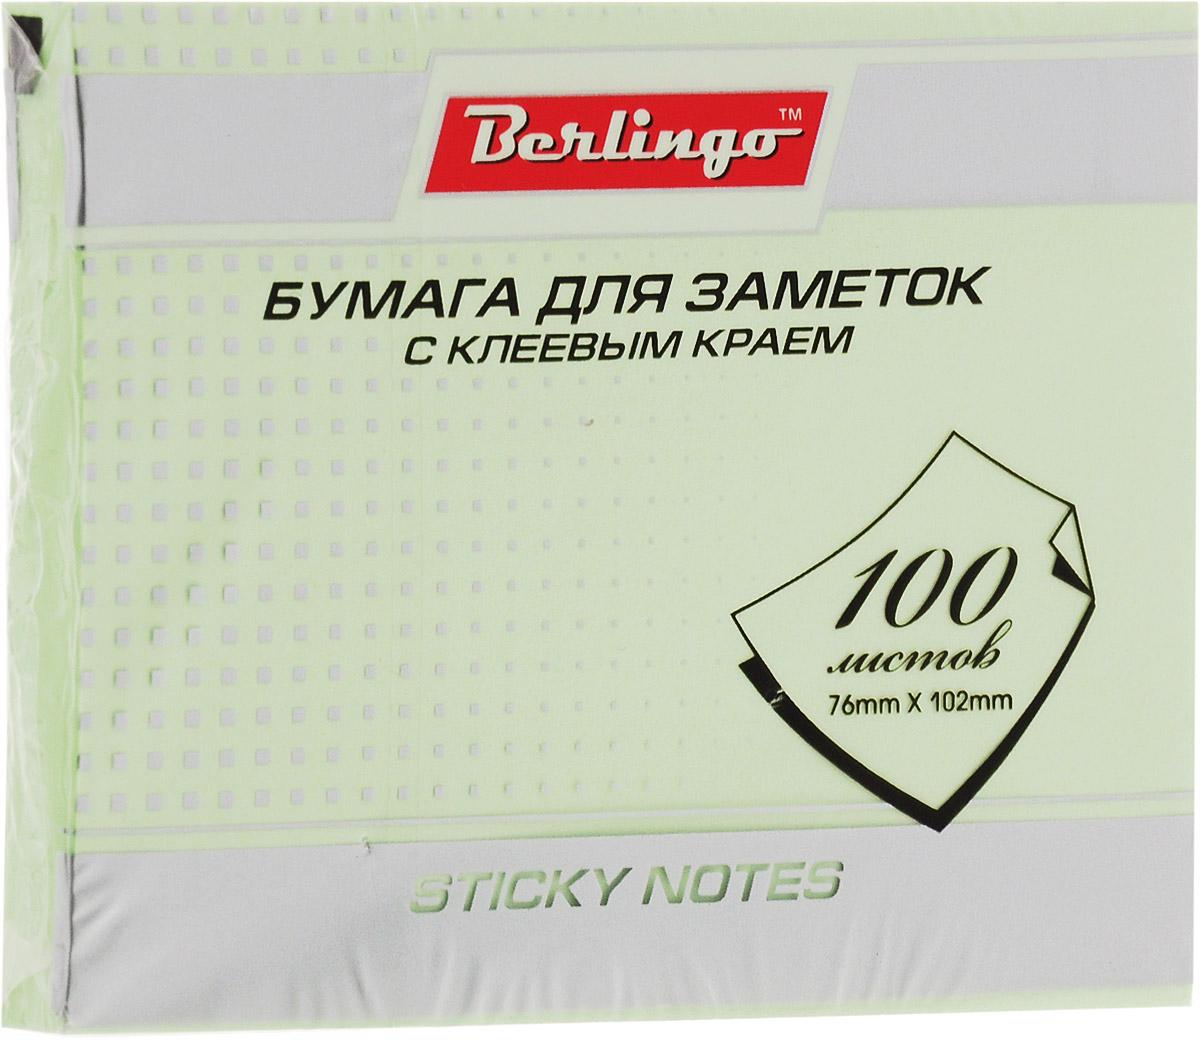 Berlingo Бумага для заметок 7,6 х 10,2 см 100 листов berlingo флипчарт premium 70 х 100 см